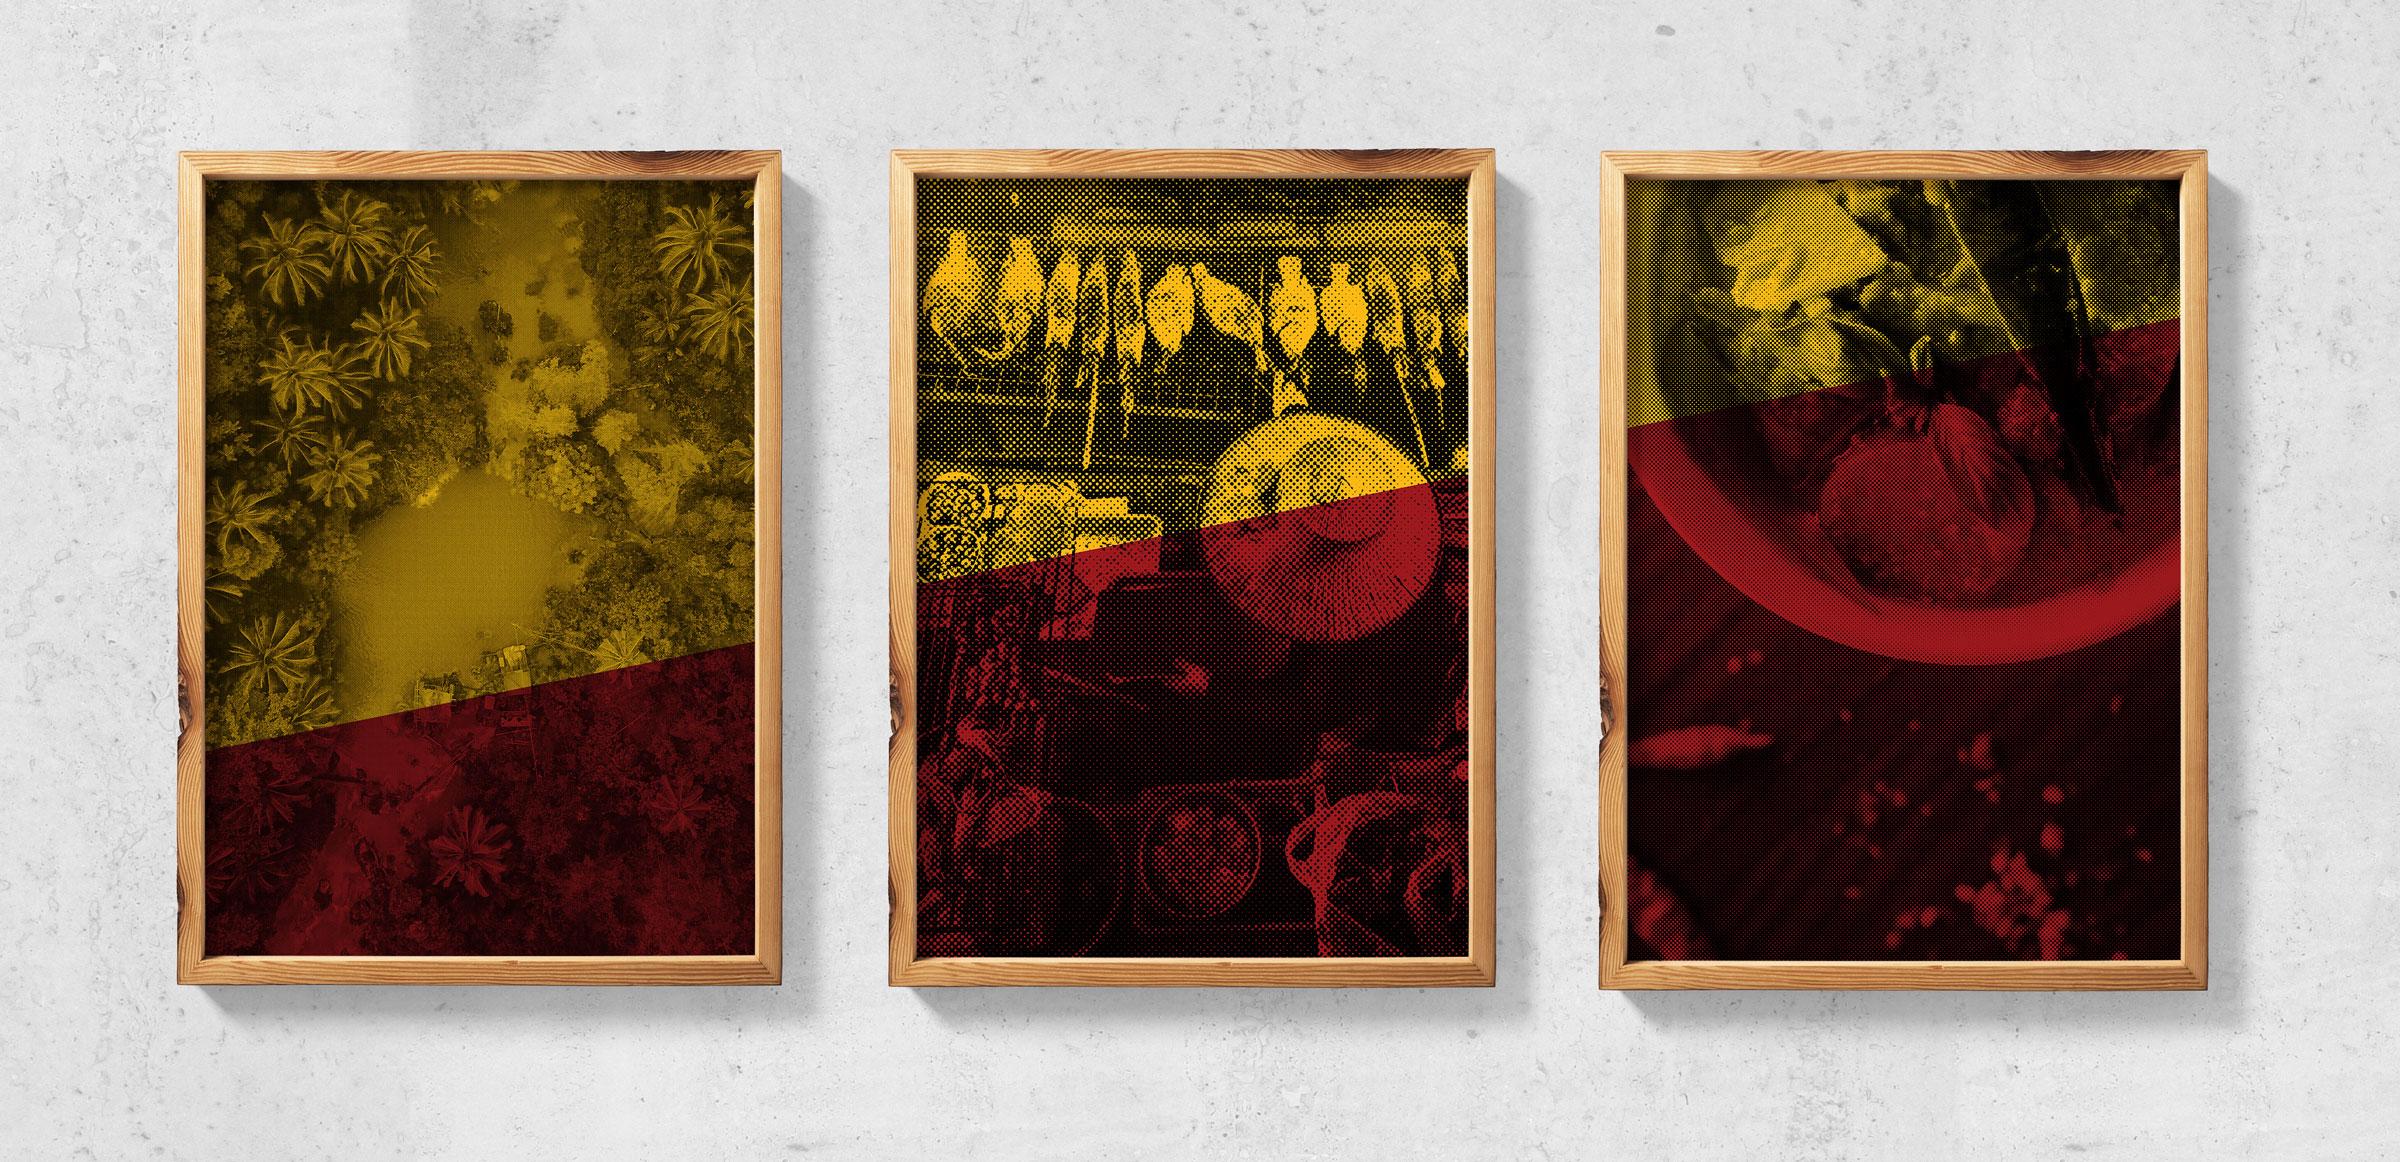 Halftone vietnamese images in wooden frames